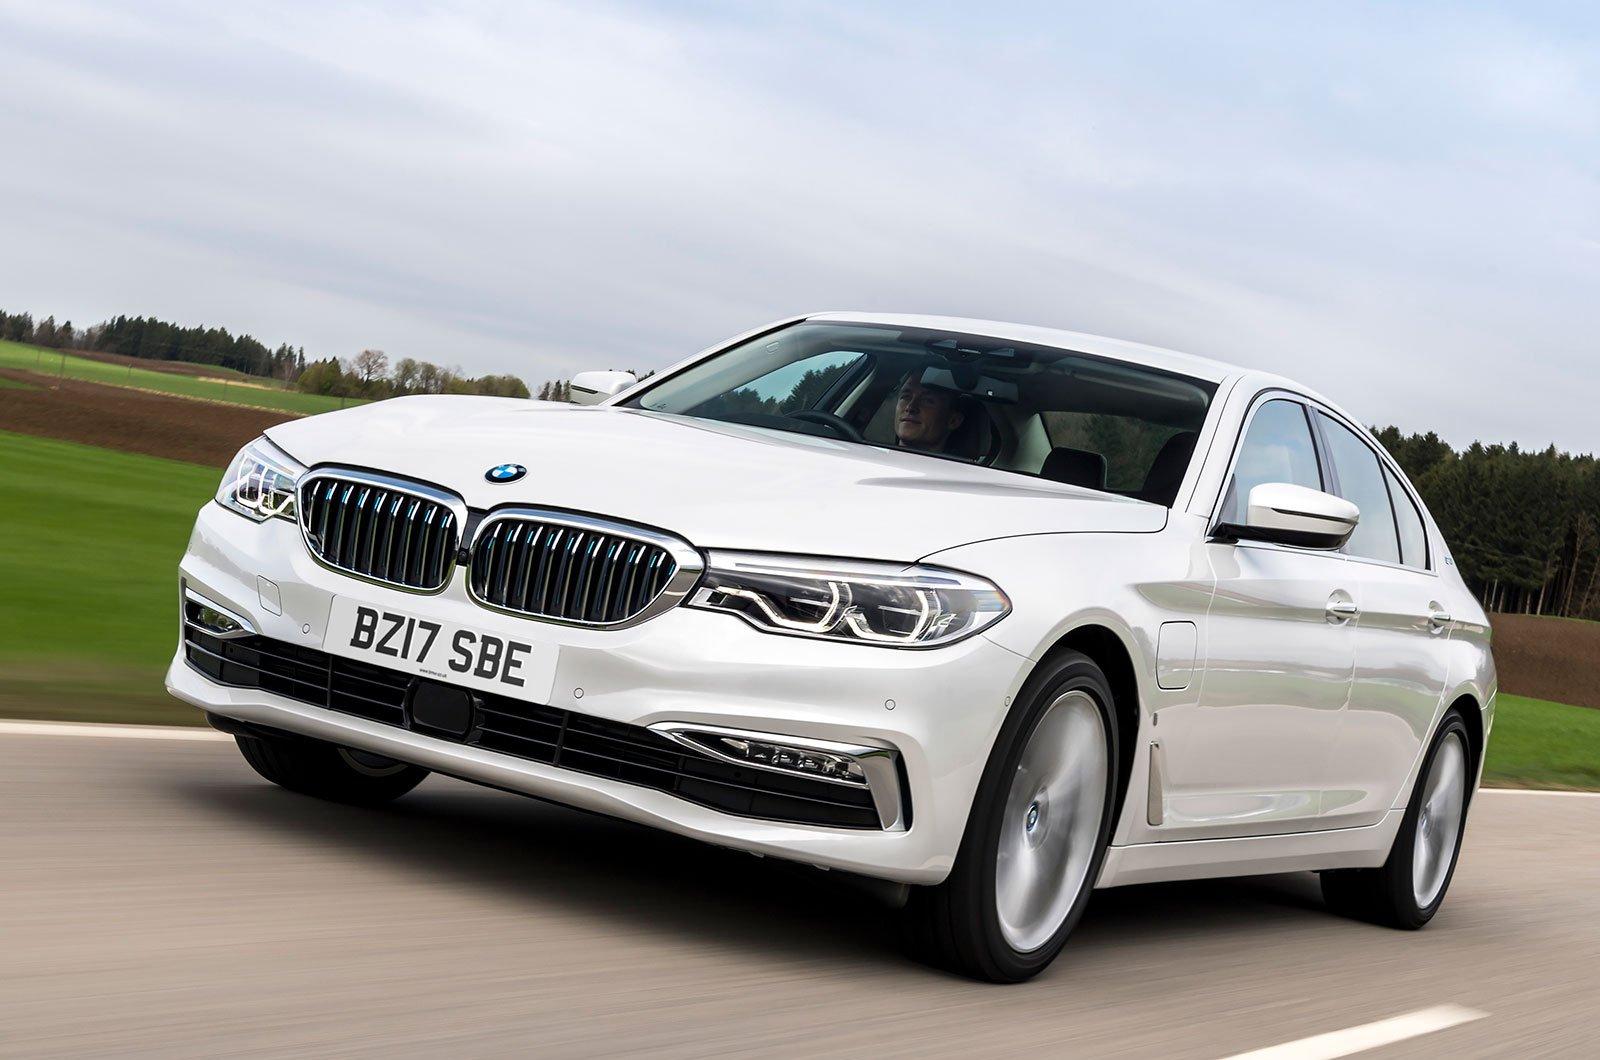 BMW 530e front